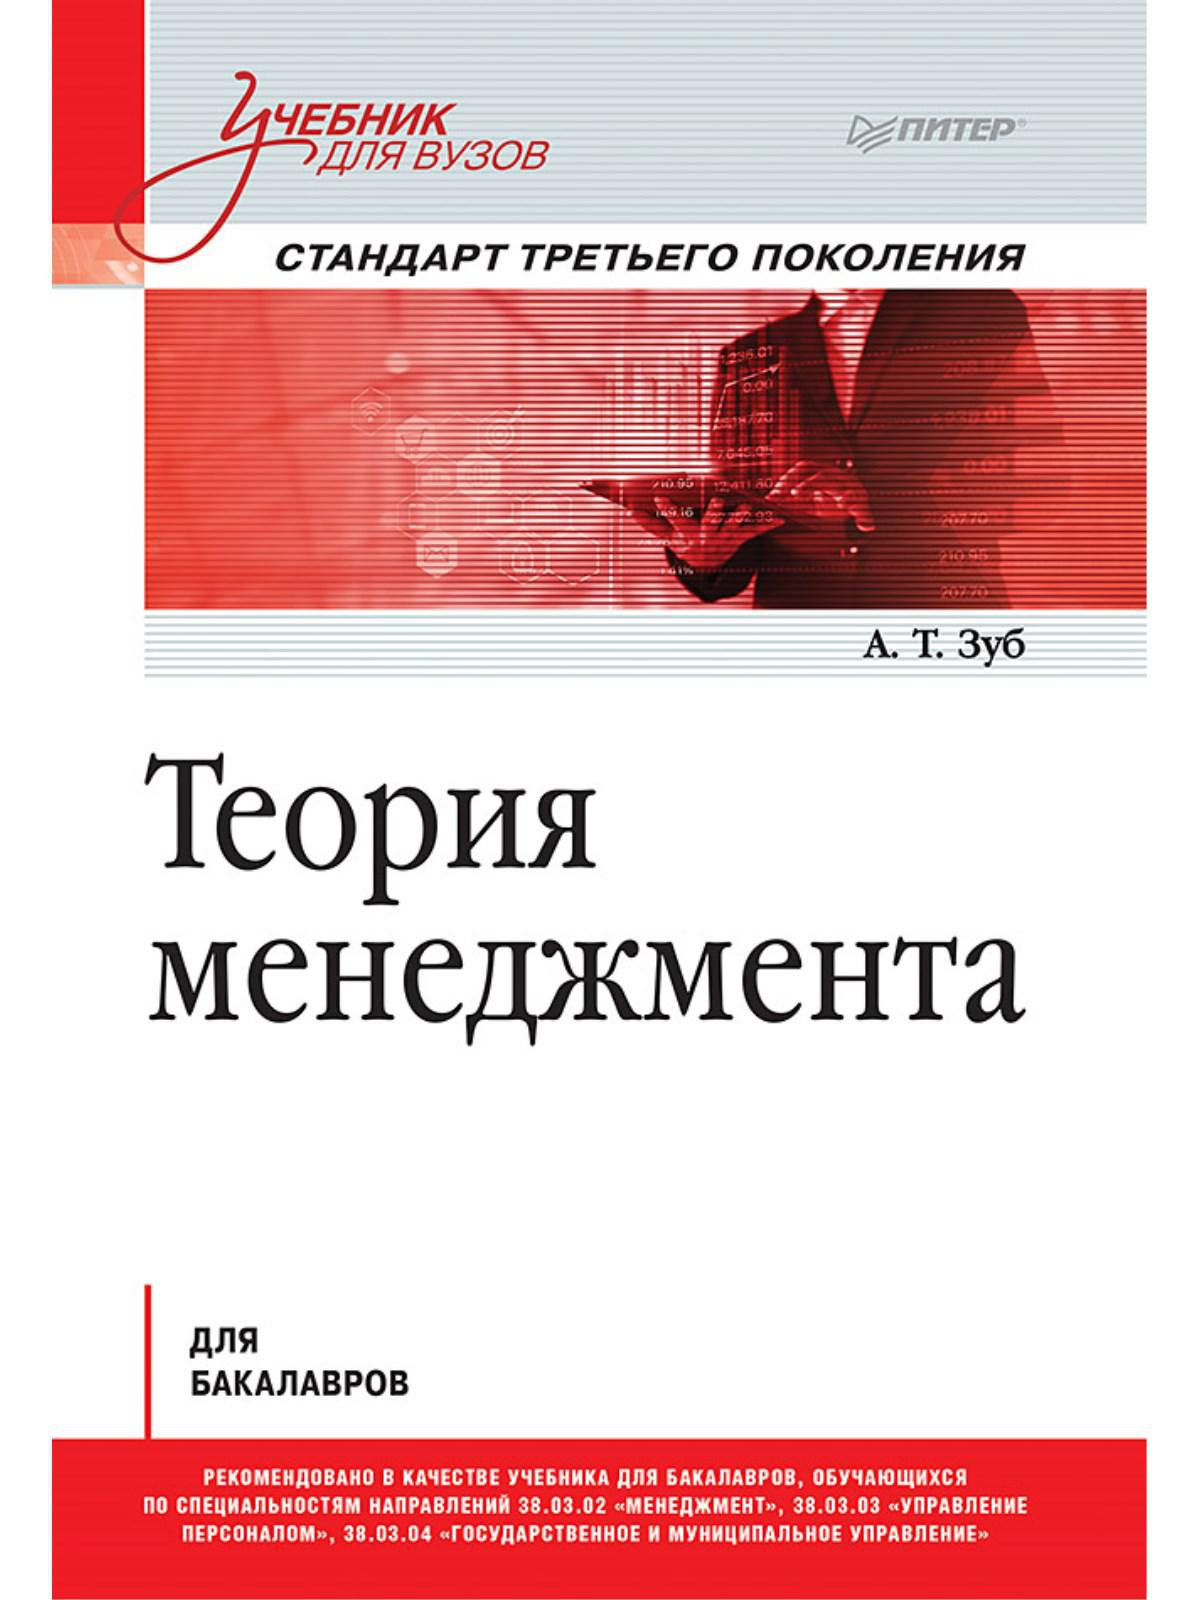 Теория менеджмента. Учебник для бакалавров ( Зуб А. Т.  )